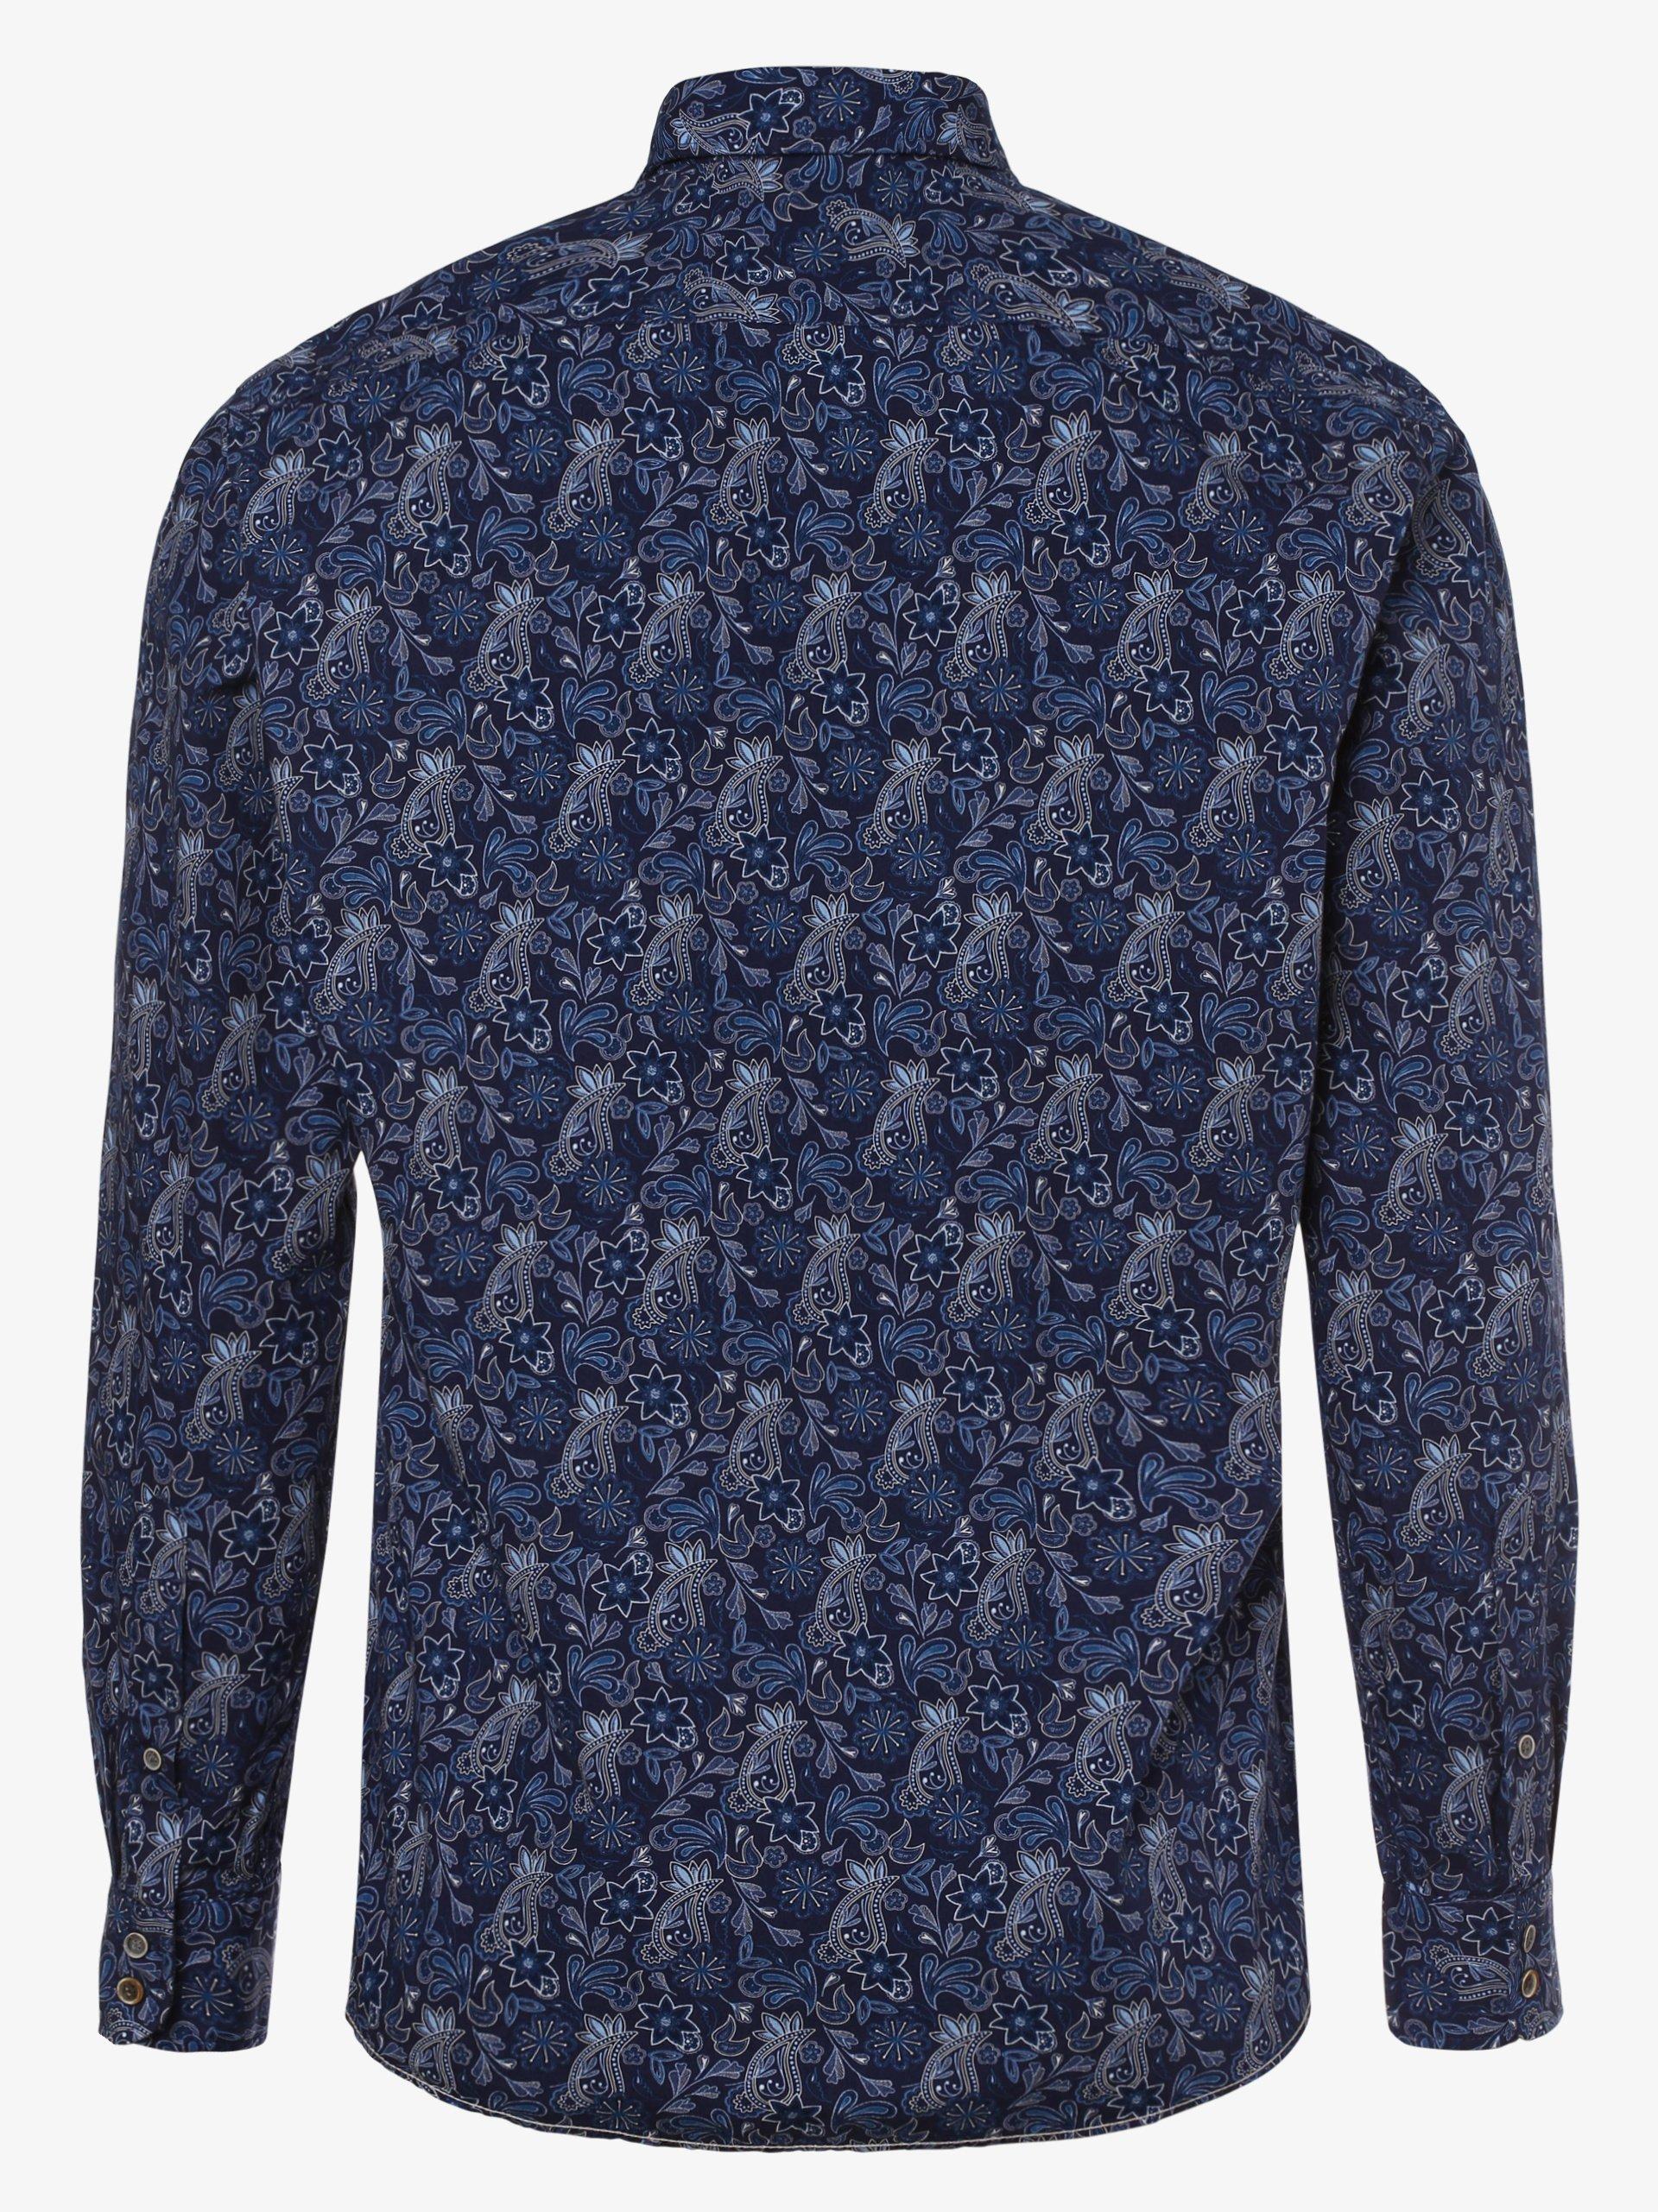 OLYMP Casual modern fit Koszula męska